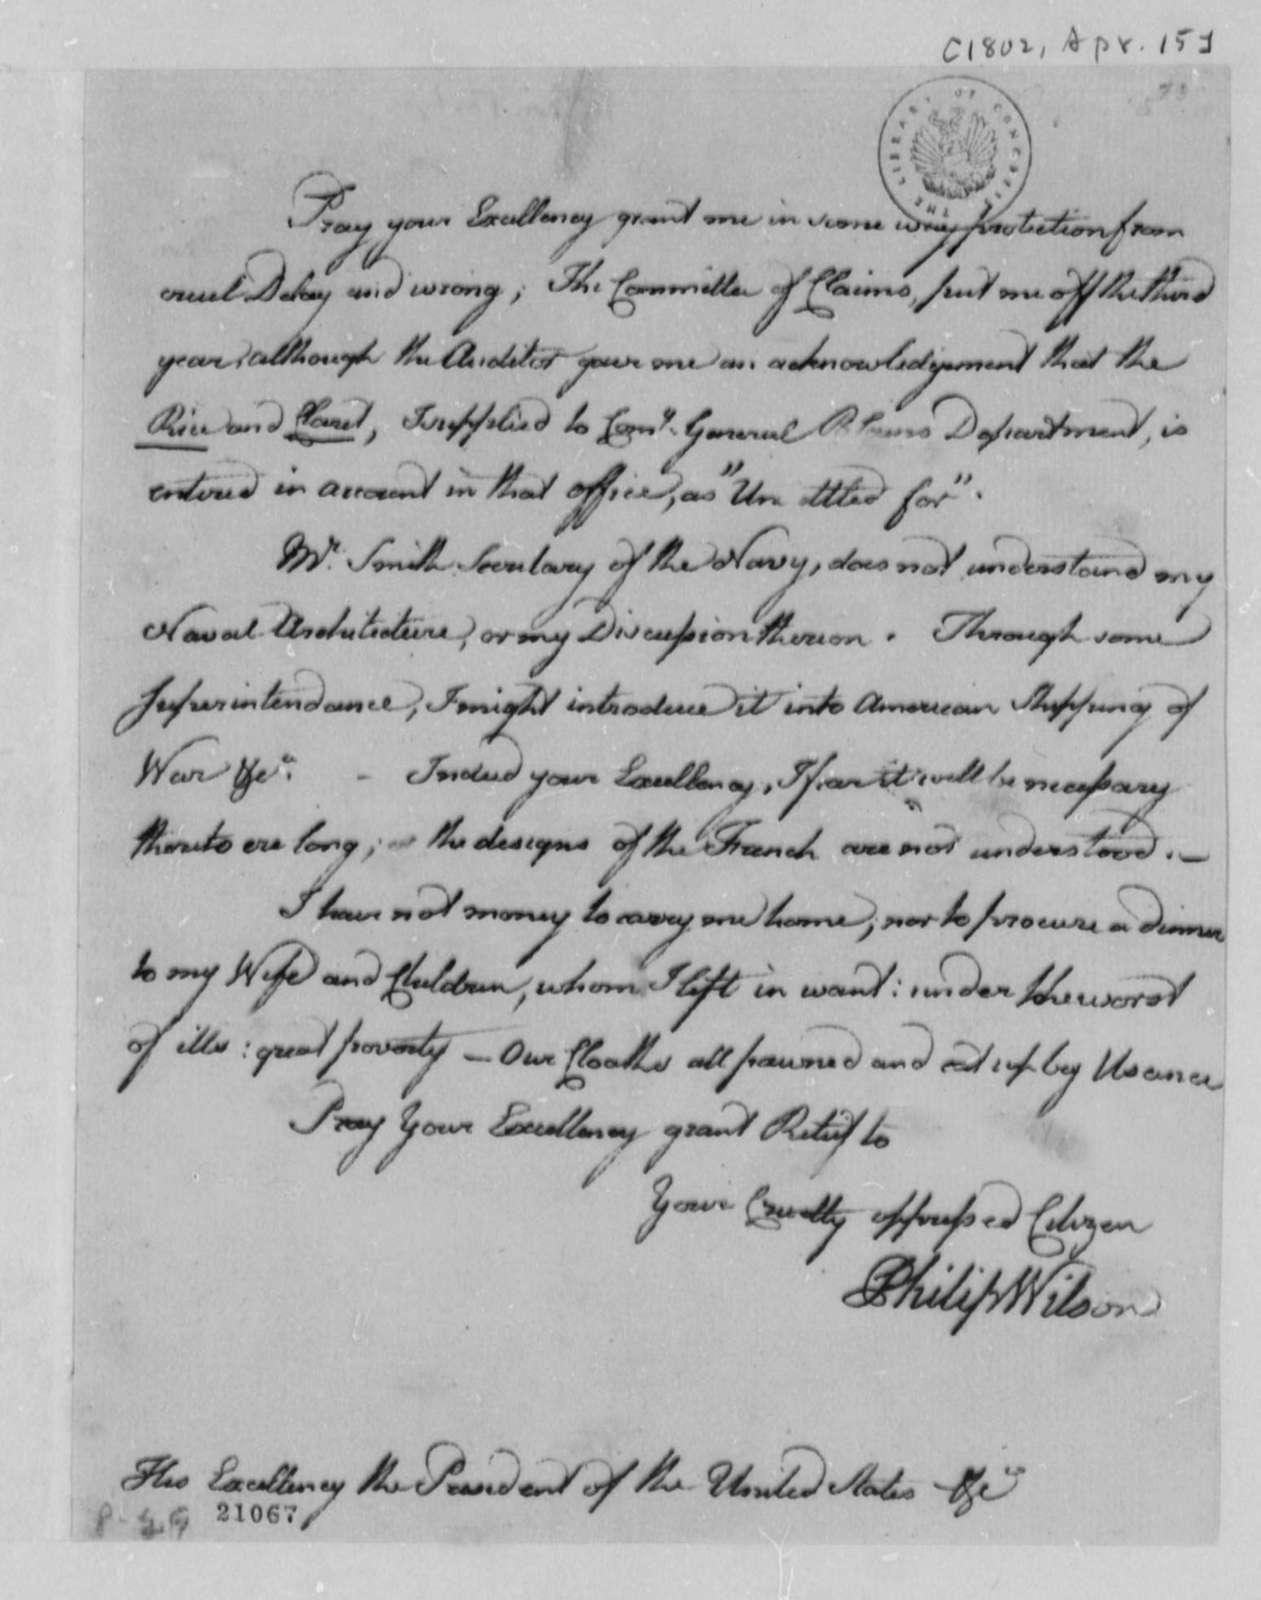 Philip Wilson to Thomas Jefferson, April 15, 1802